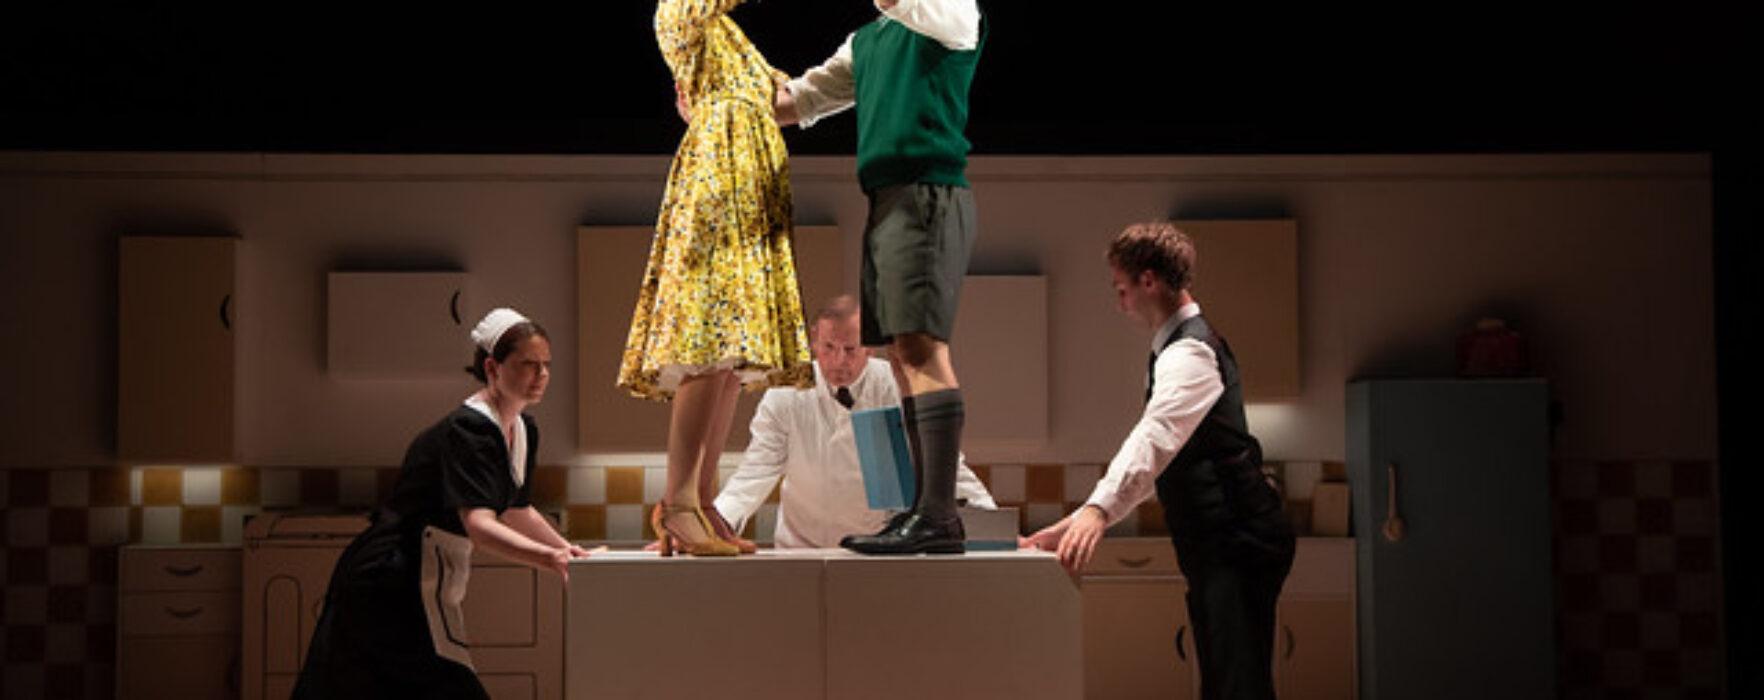 VIVA interviews Henry Filloux-Bennett on the show Toast as it returns to Manchester in November